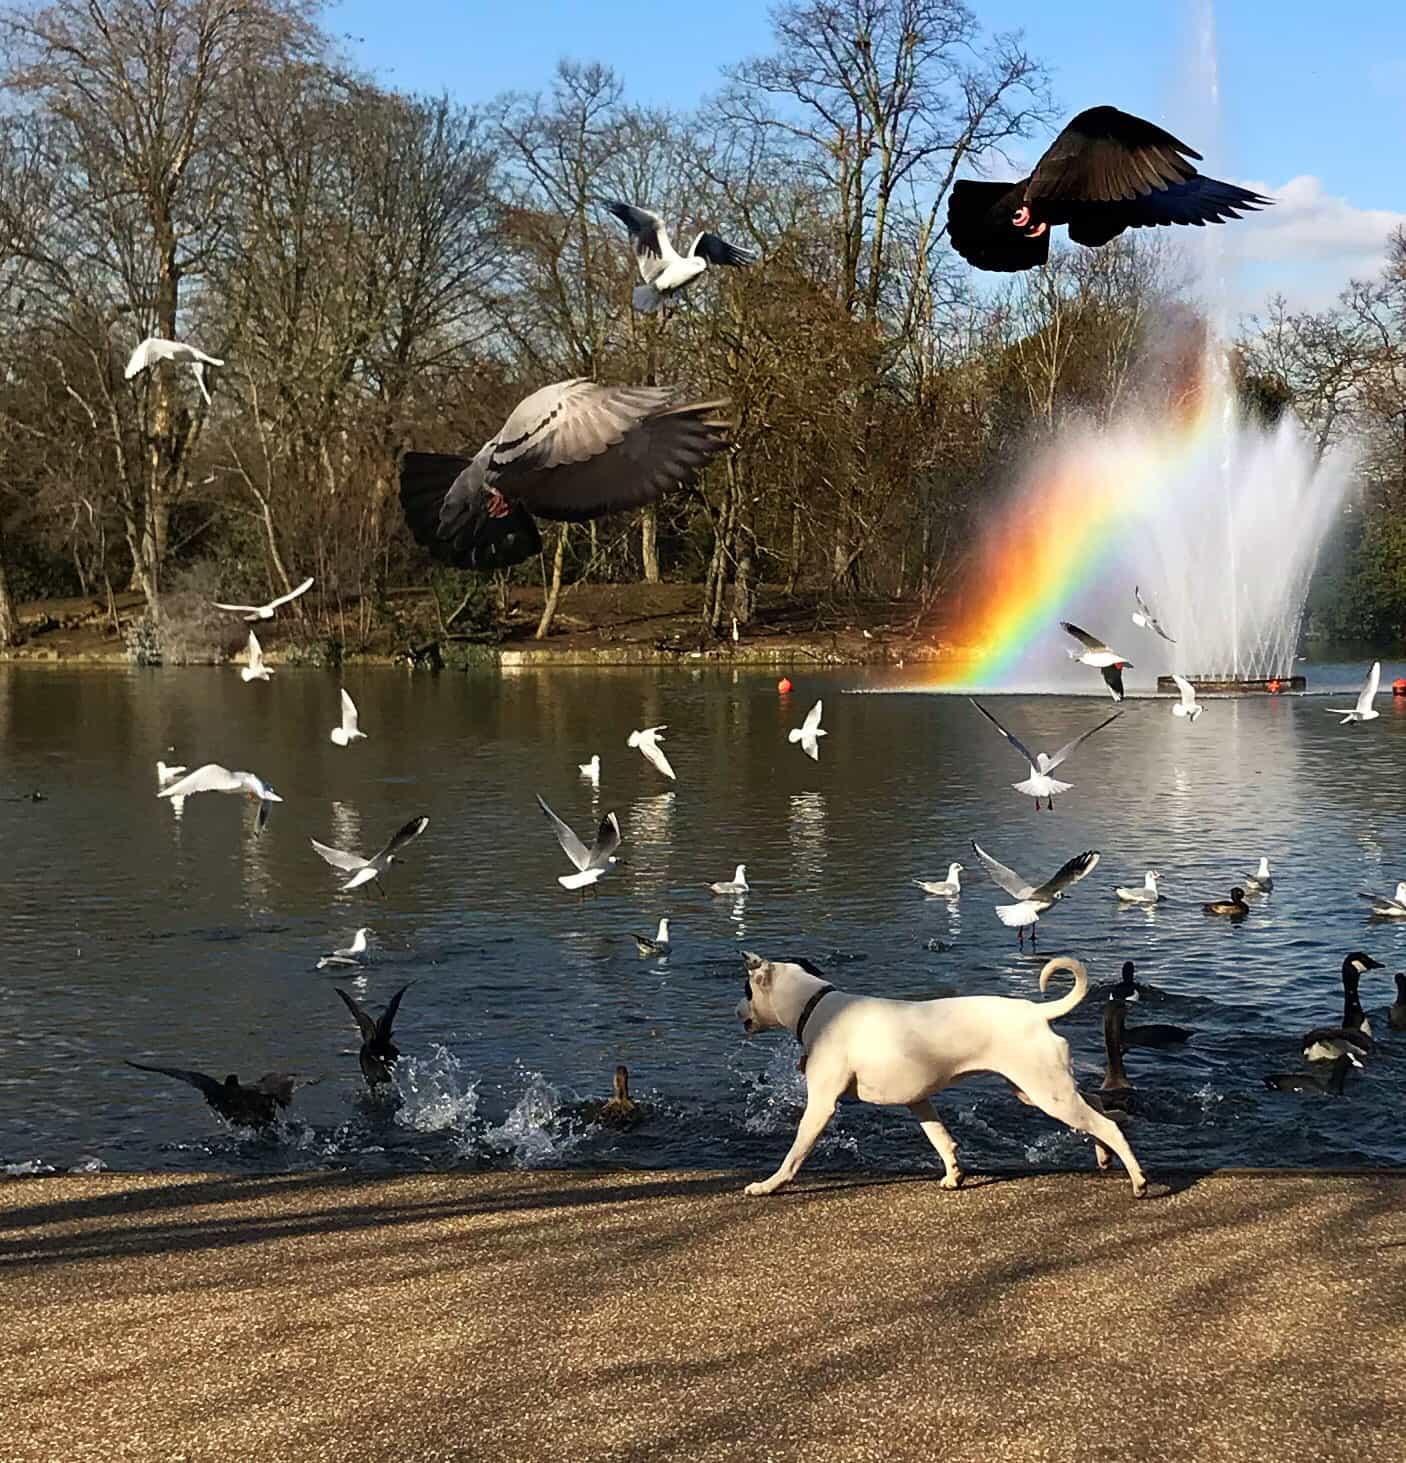 Victoria Park by James Falconer